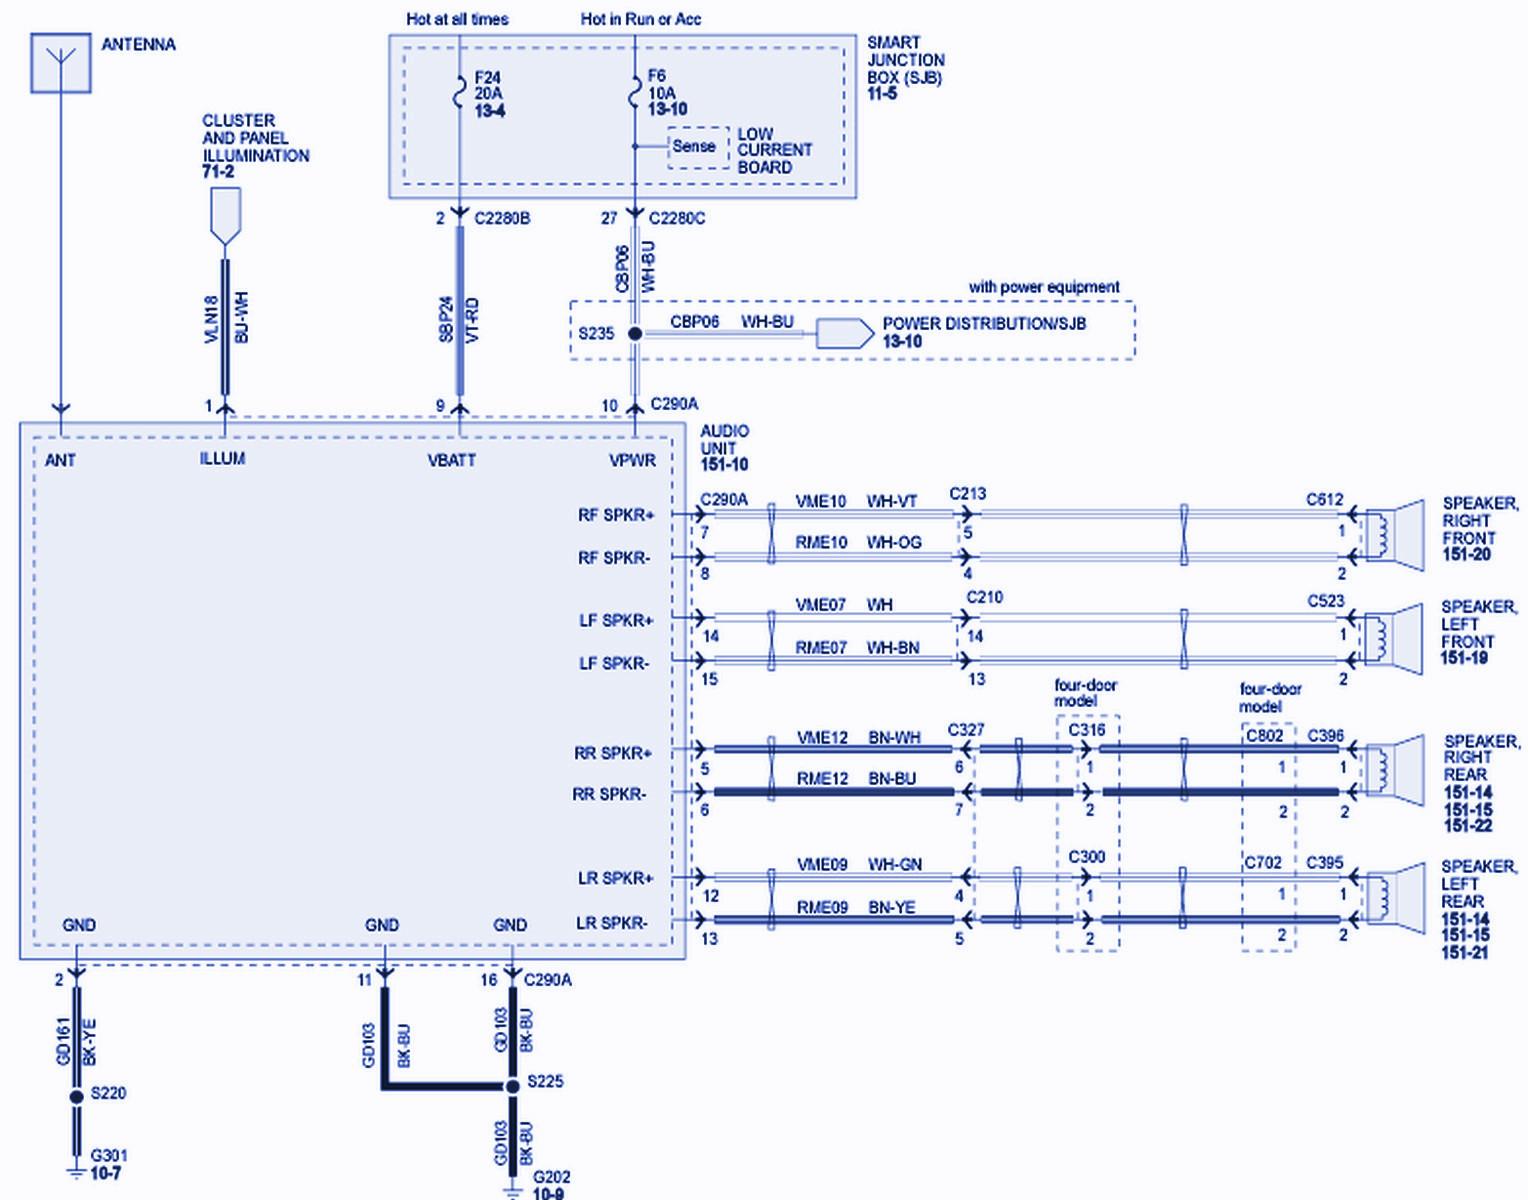 2010 f350 wiring diagram schema diagram database 2010 ford ranger wiring diagram 2010 f250 wiring diagram [ 1528 x 1200 Pixel ]